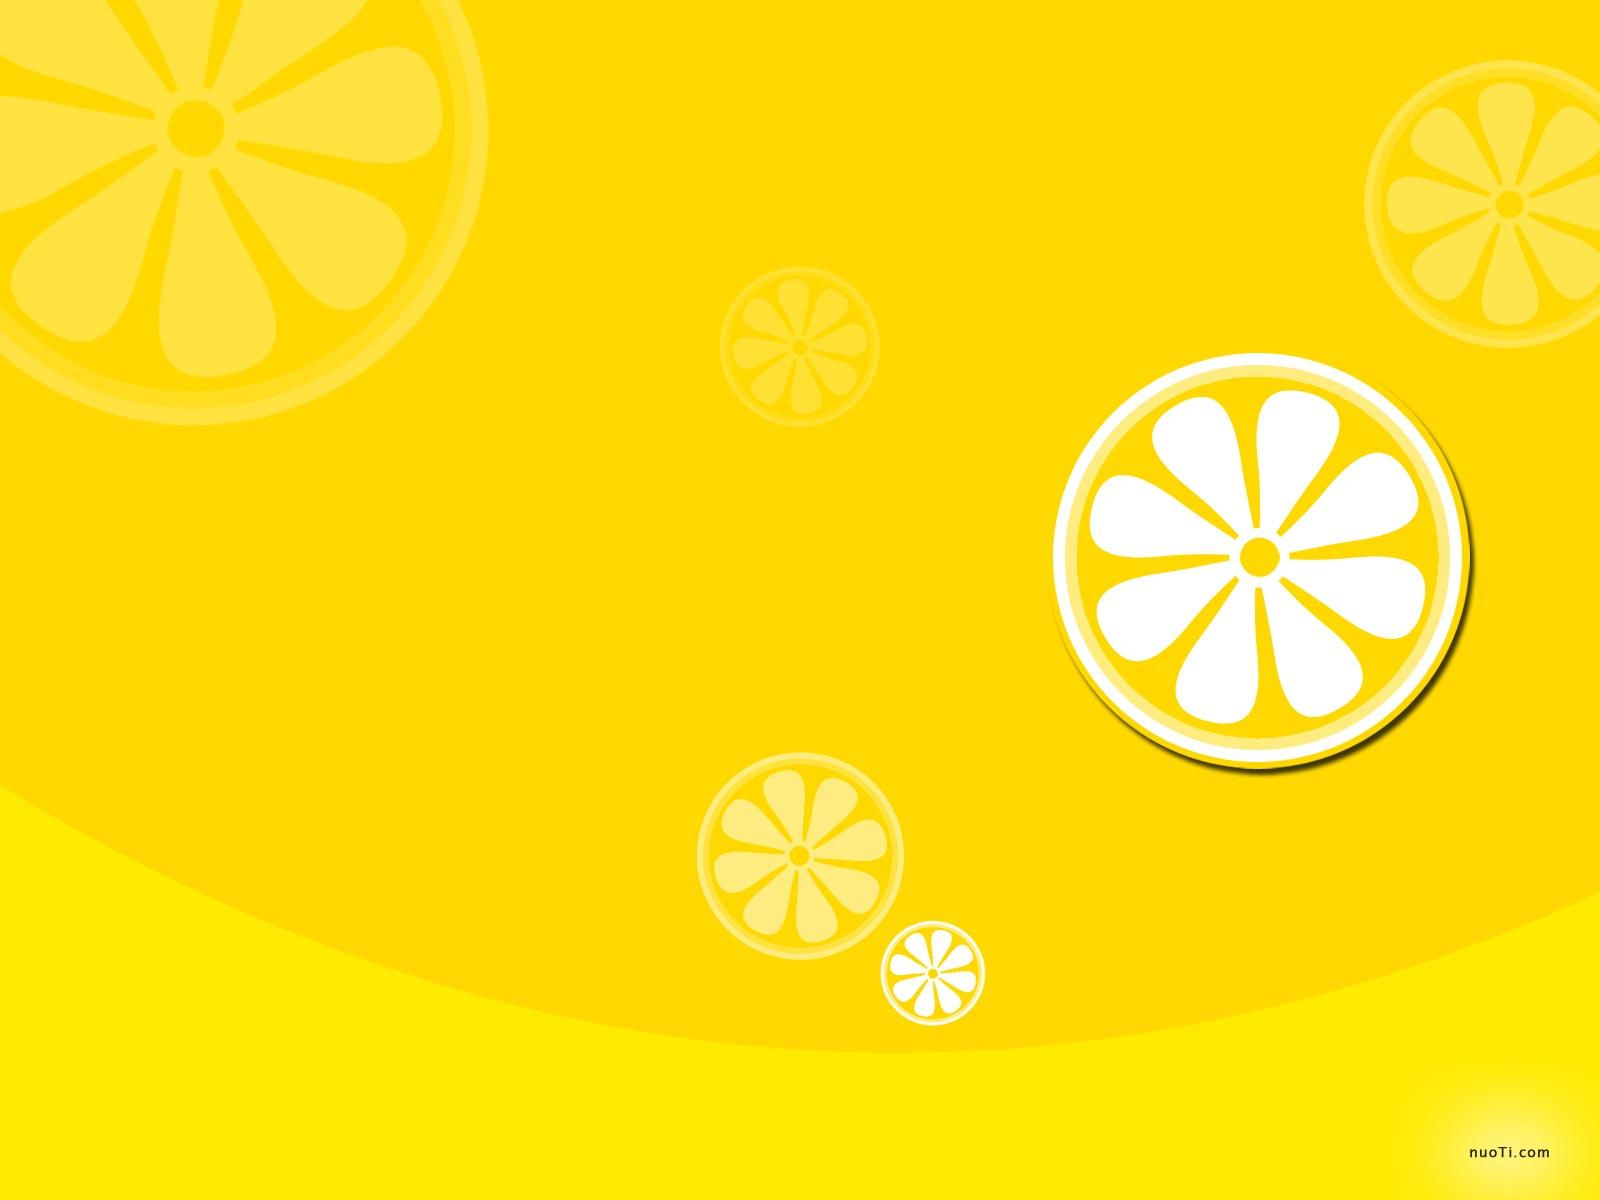 The Yellow Wallpaper Comprehension Questions Wallpapersafari